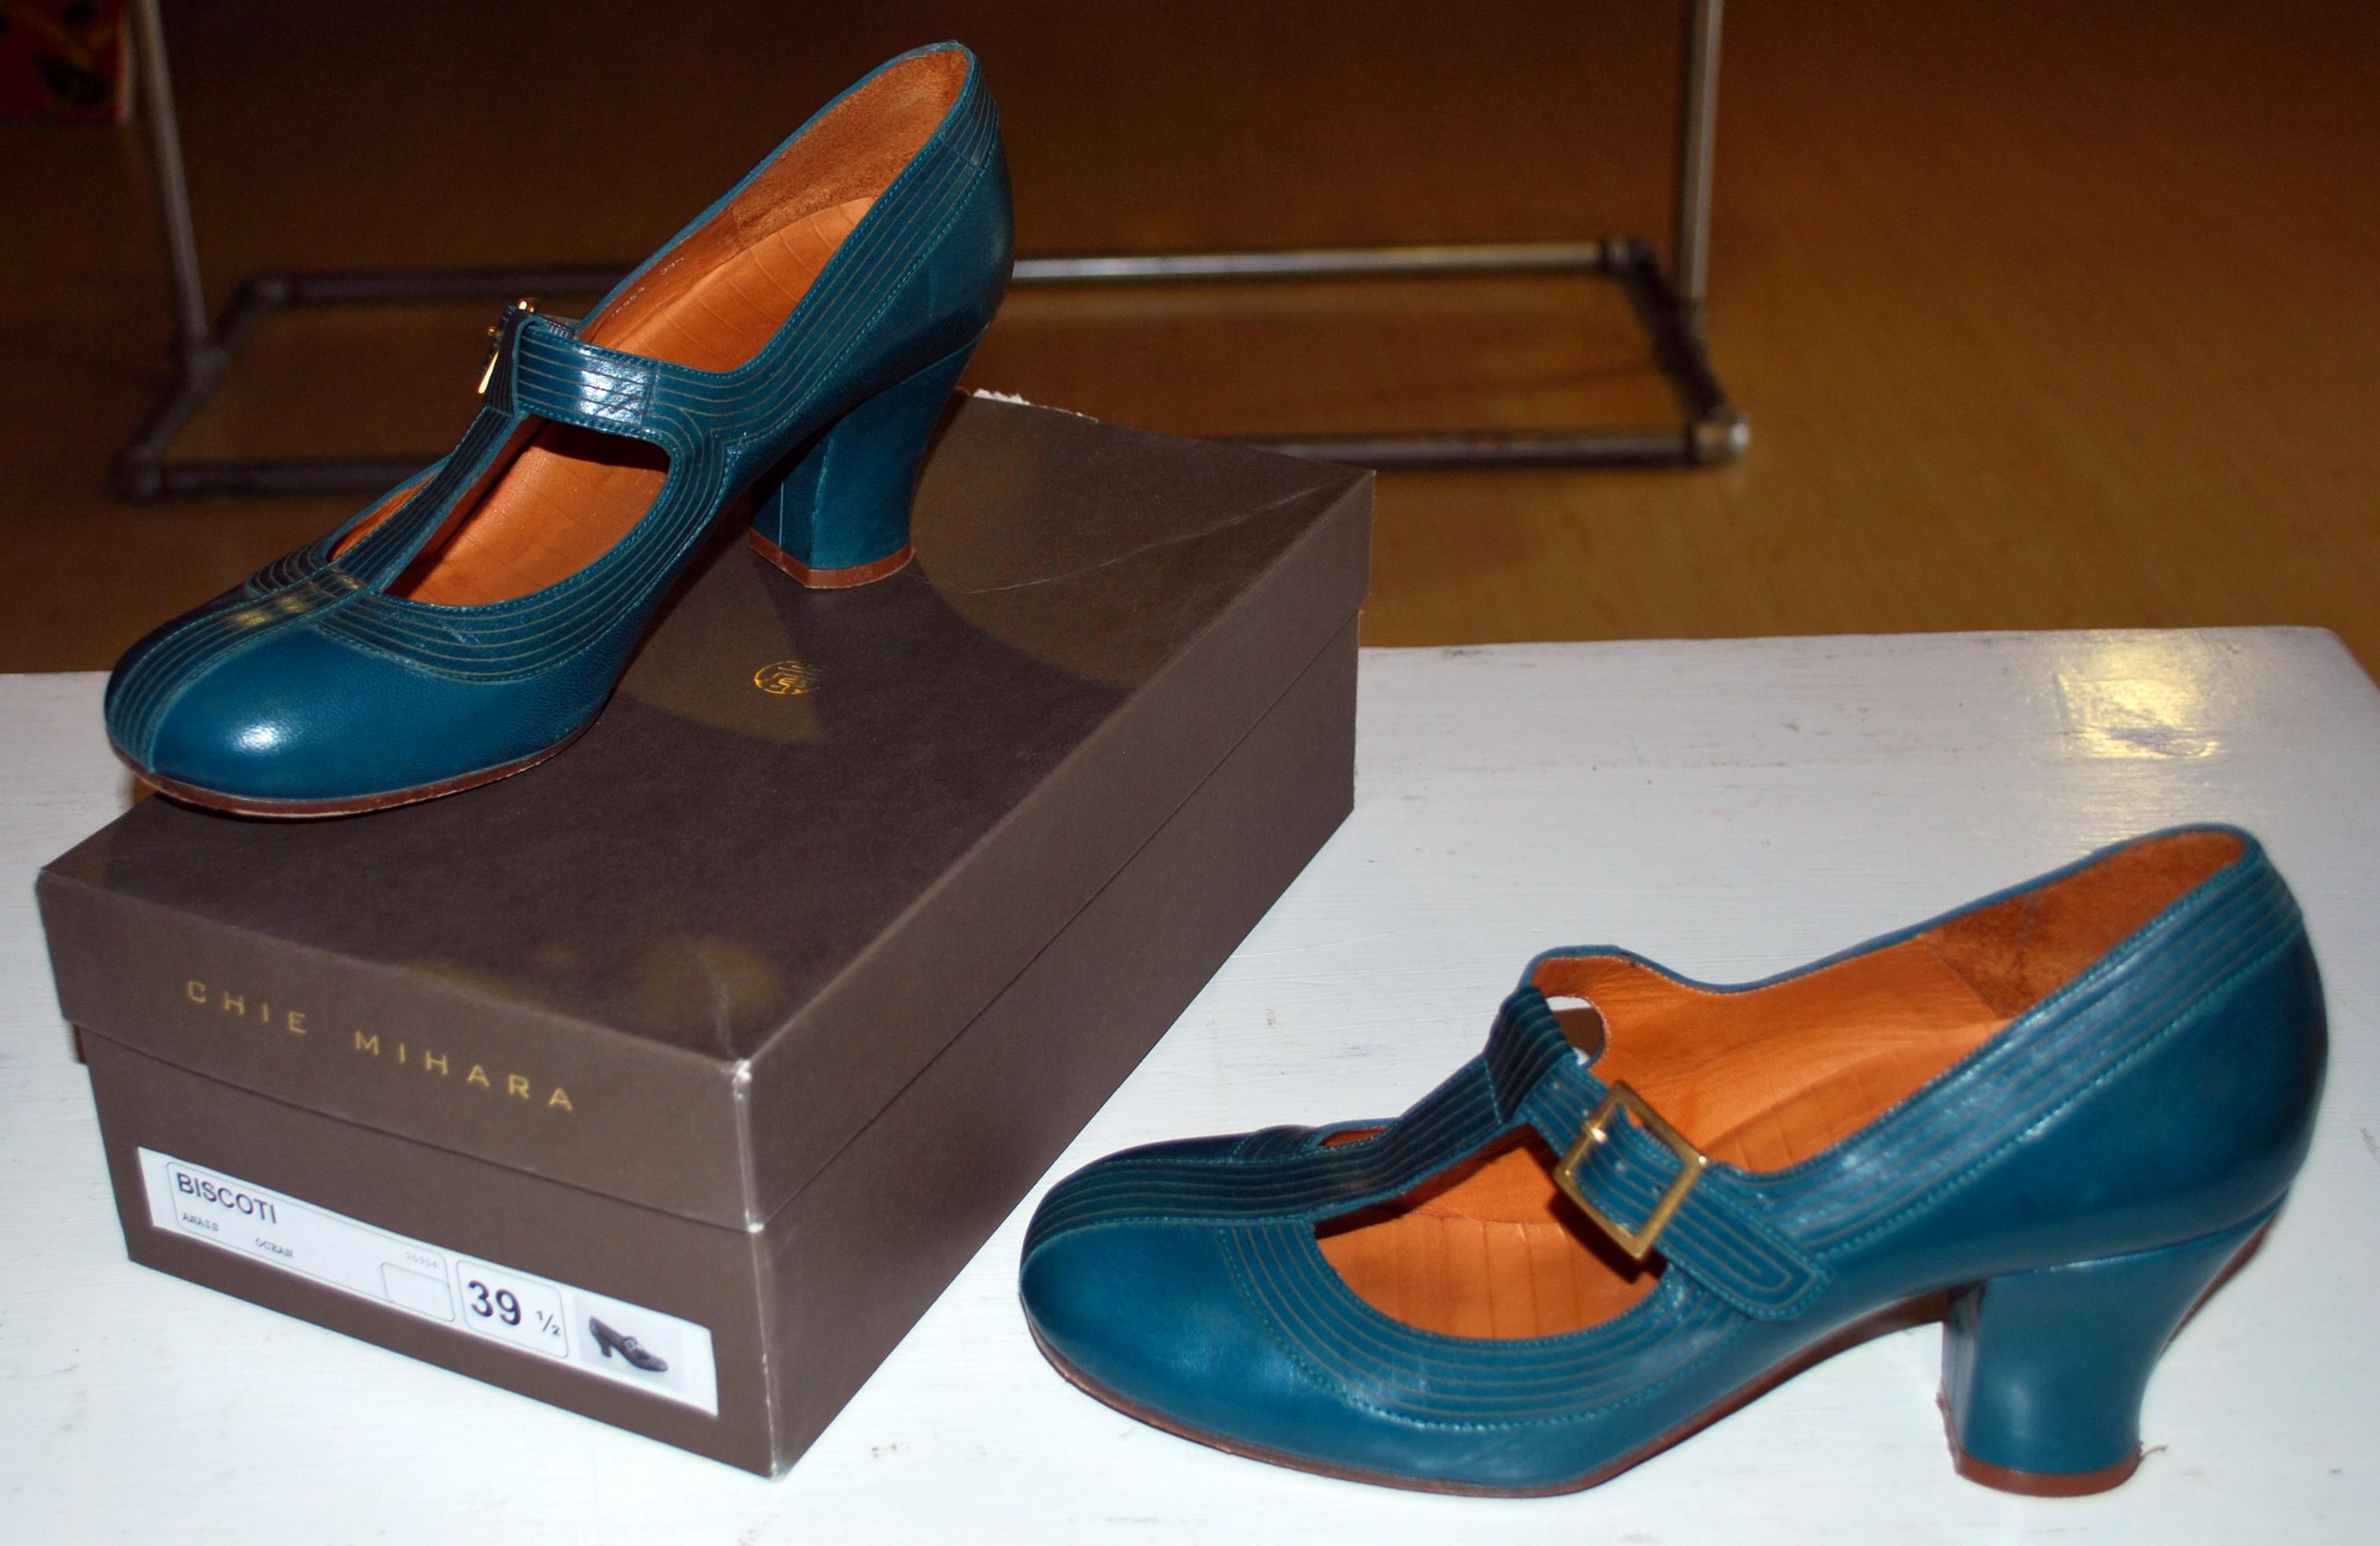 items for sale chie mihara biscotti shoes hayden harnett handbag eva franco anna sui lots. Black Bedroom Furniture Sets. Home Design Ideas